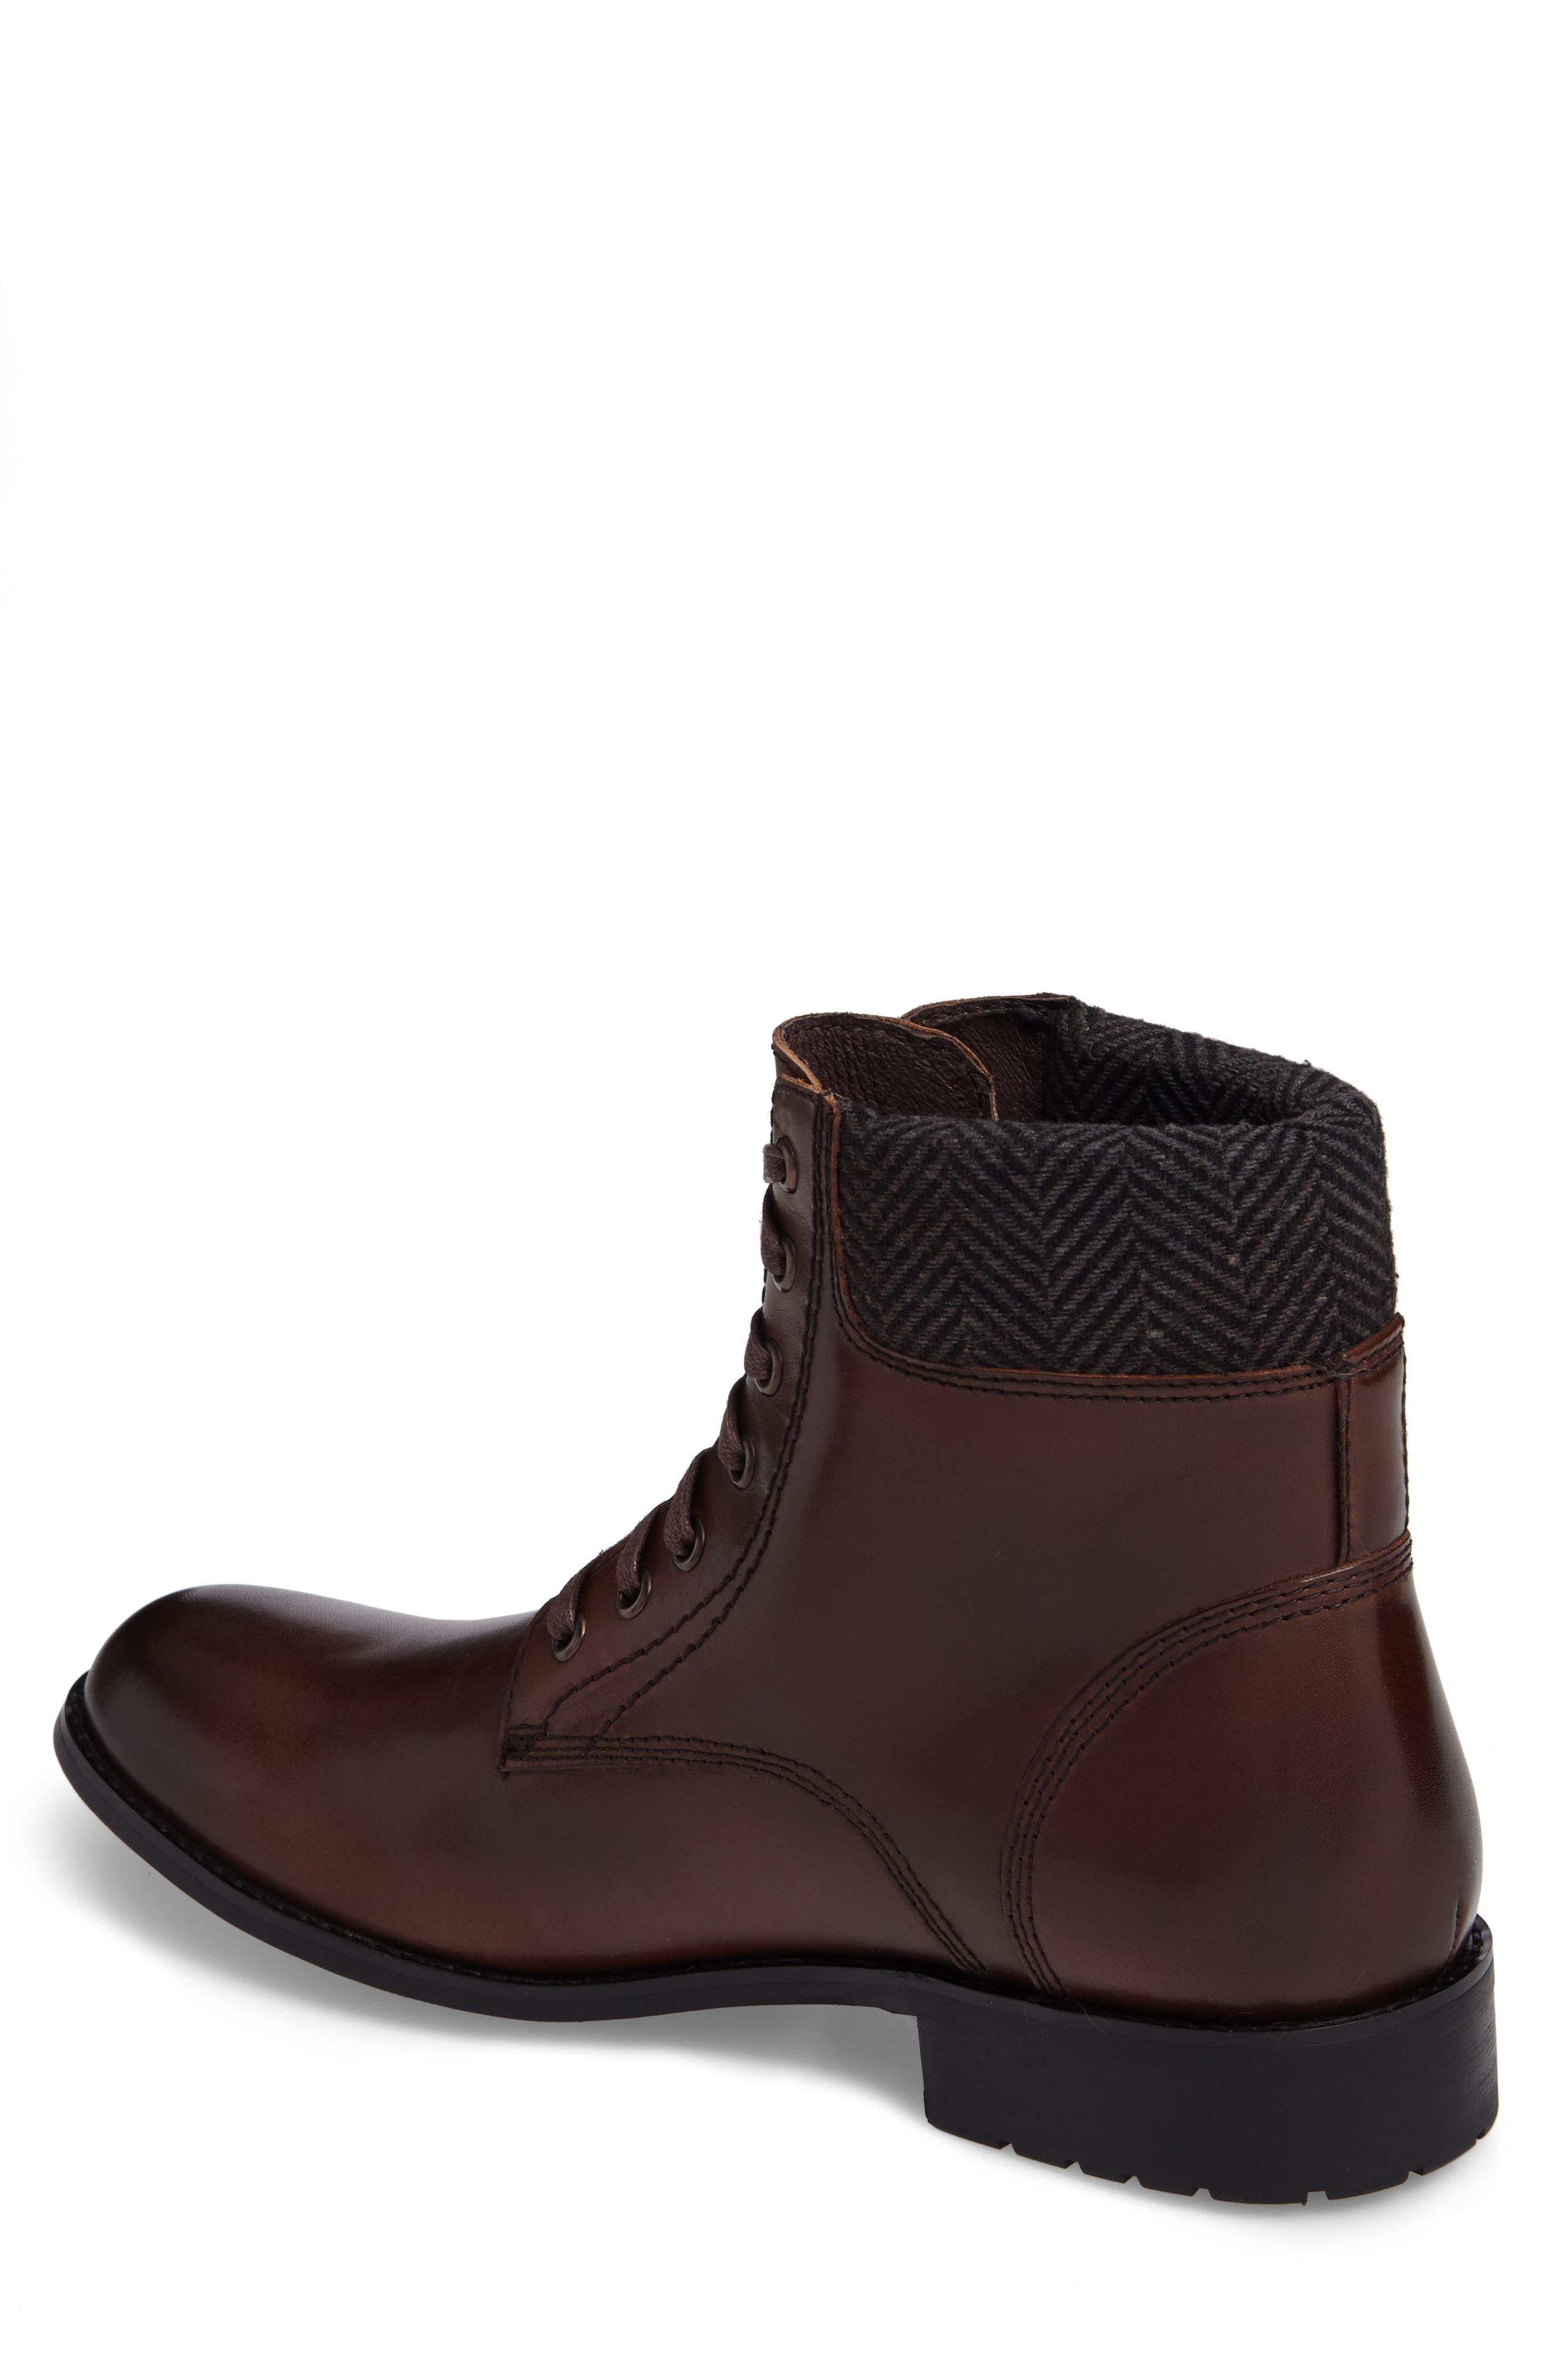 Saar Plain Toe Boot,                             Alternate thumbnail 5, color,